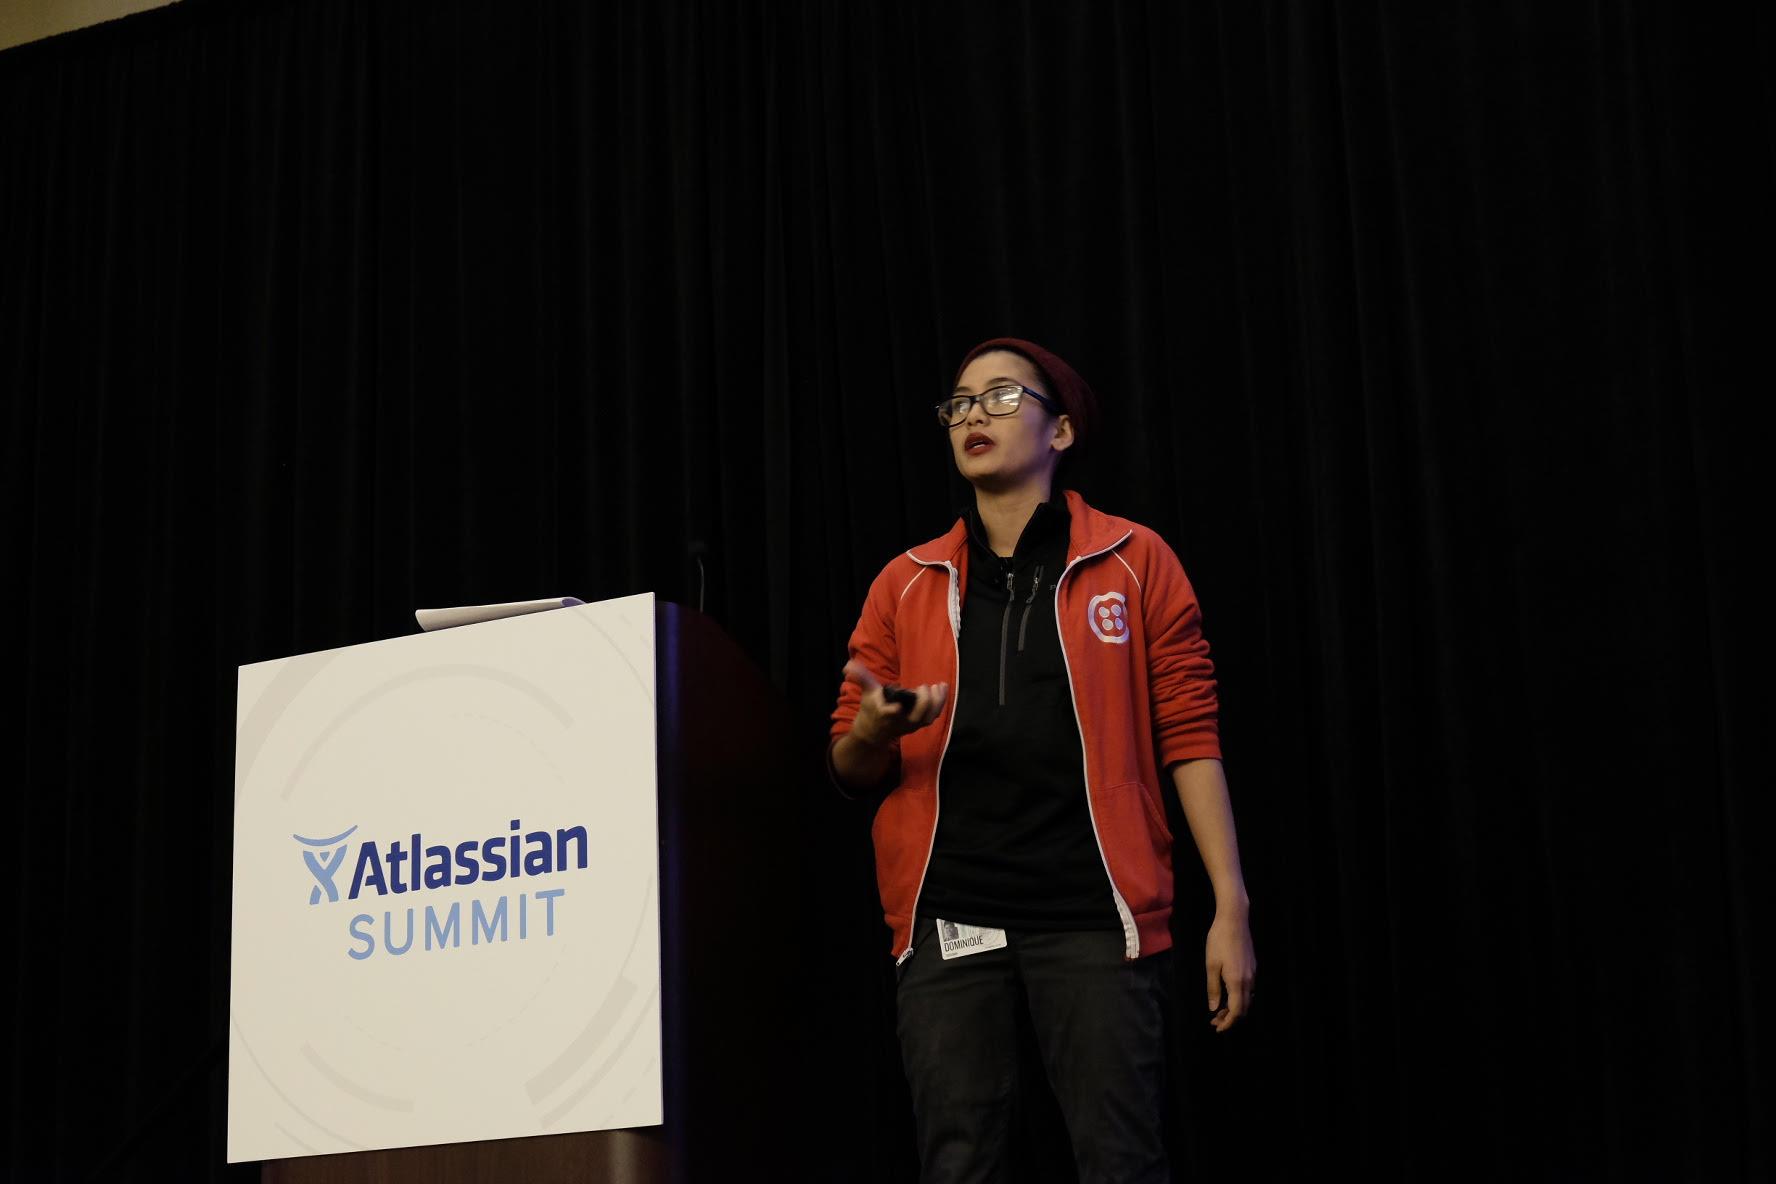 Twilio automates the JIRA admin - Atlassian Summit 2016